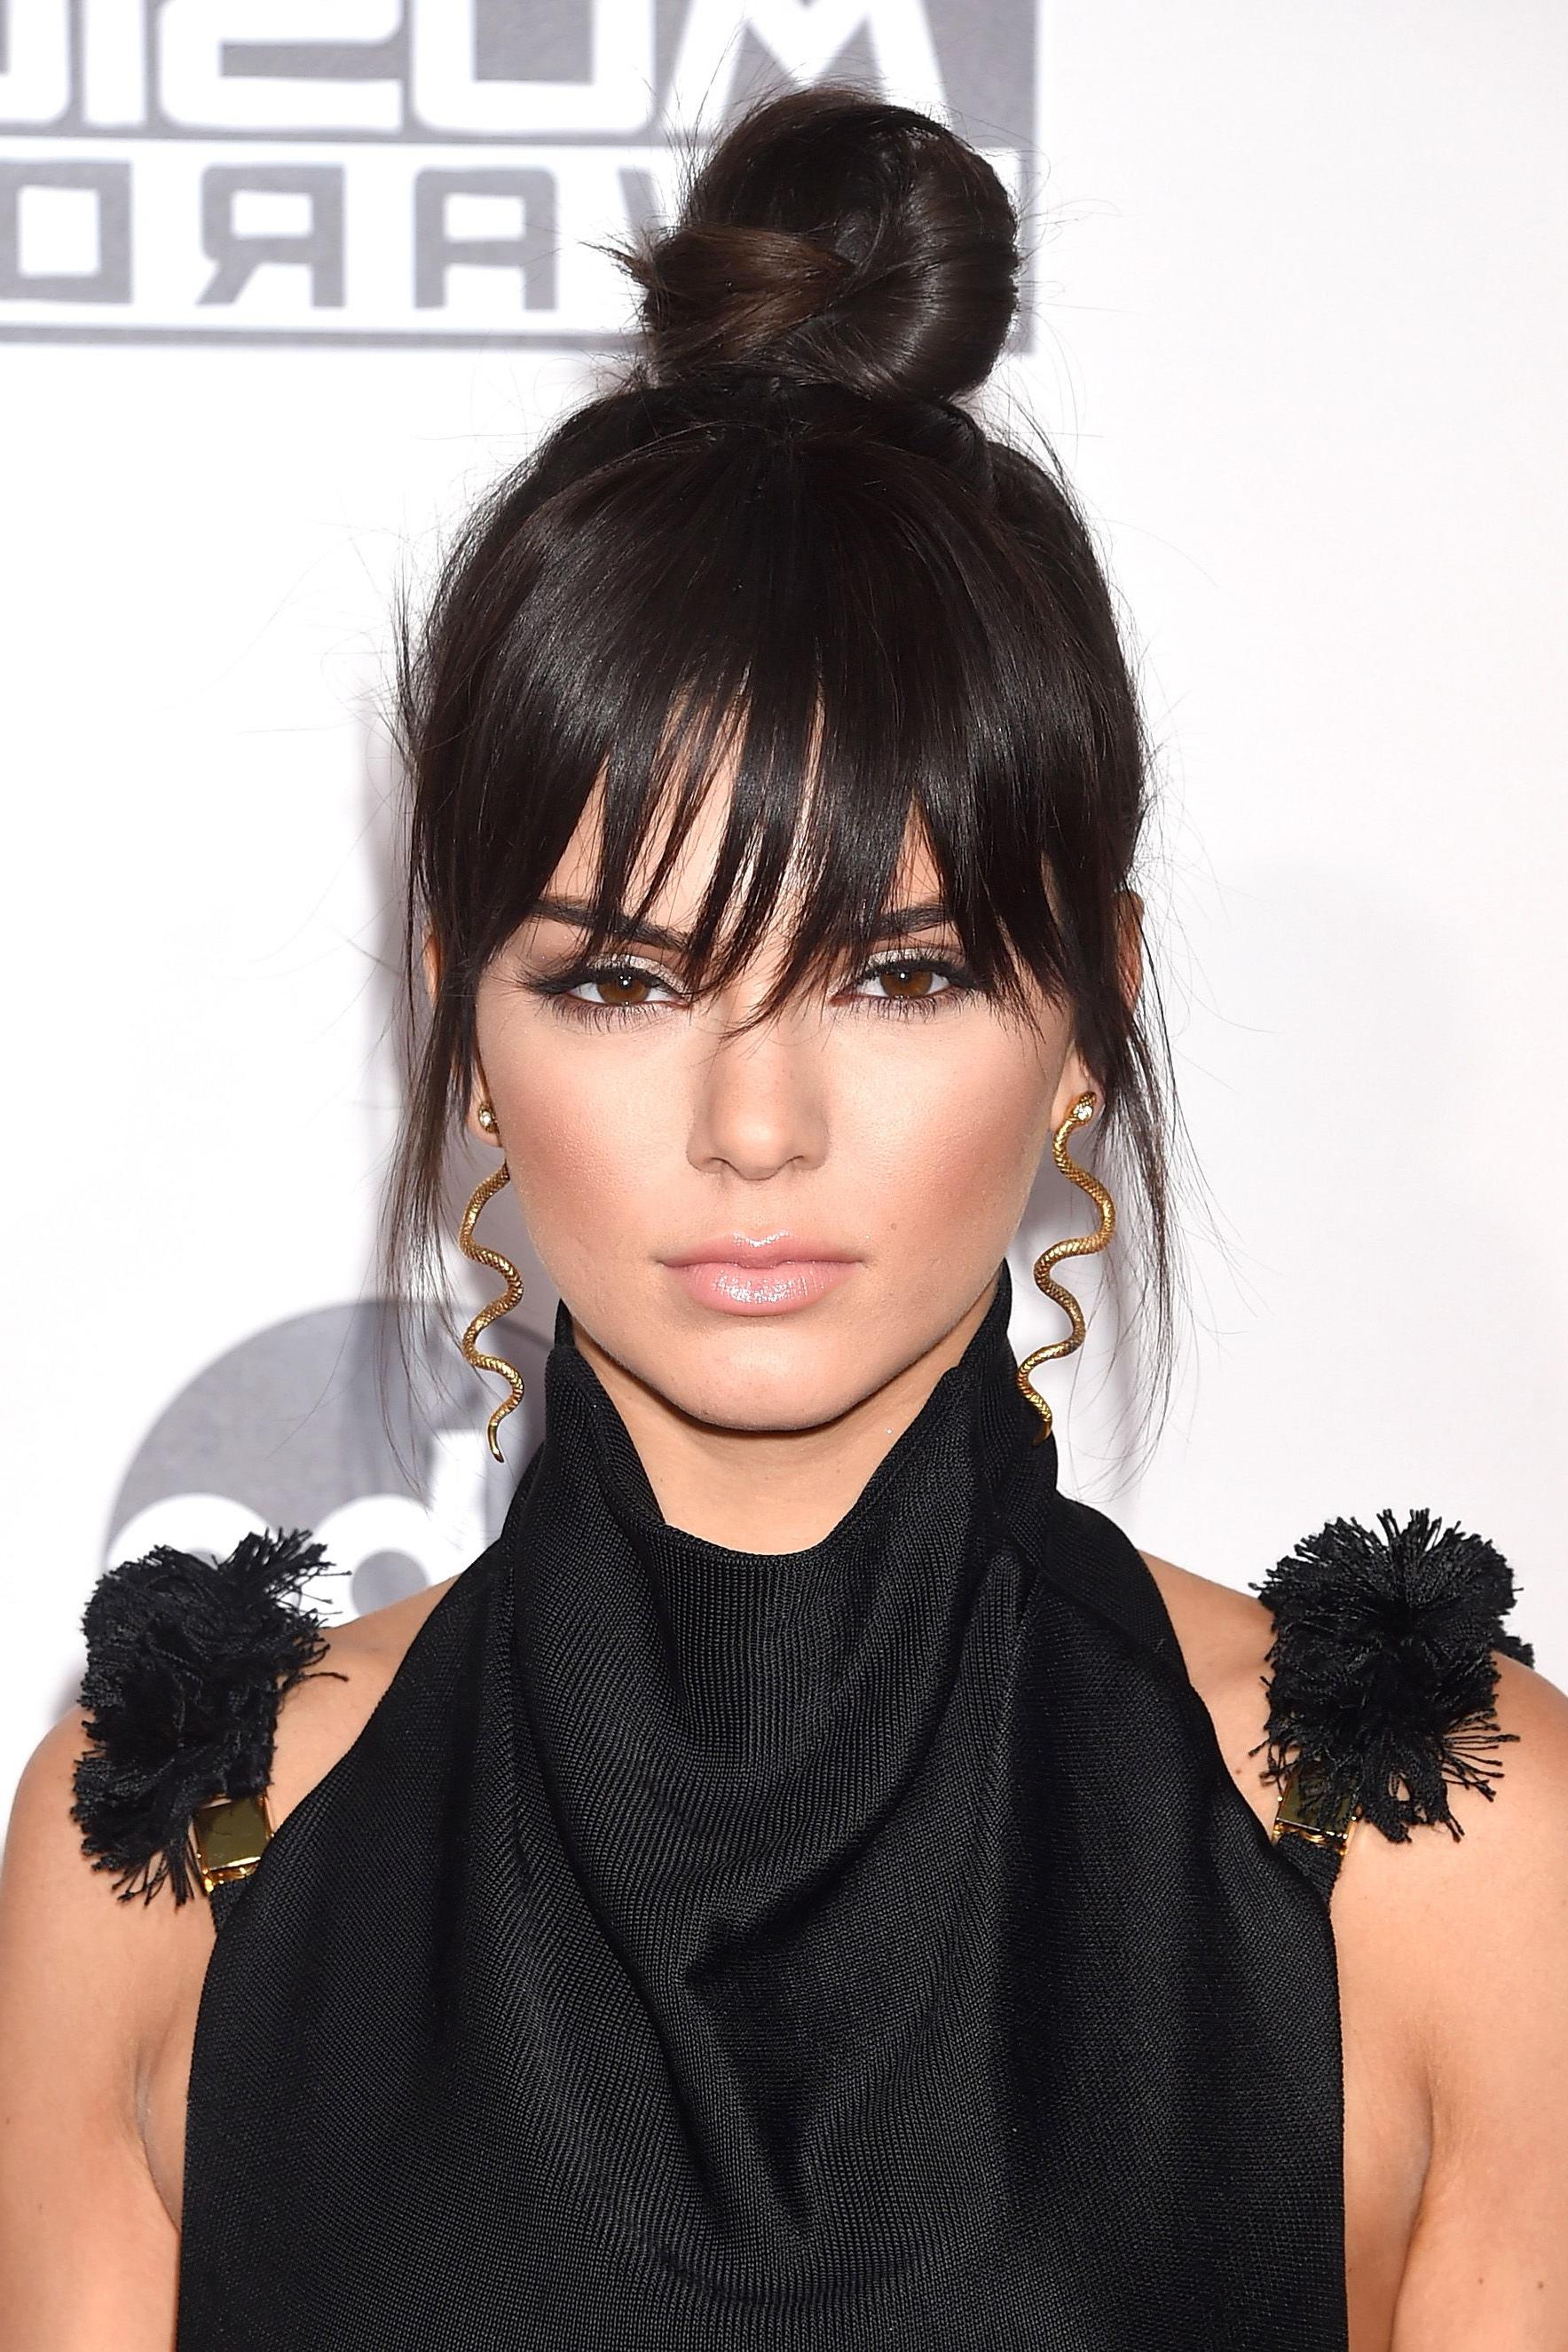 Newest Kris Jenner Medium Hairstyles Inside 65 Kendall Jenner Hair Looks We Love – Kendall Jenner's Hairstyle (View 5 of 20)